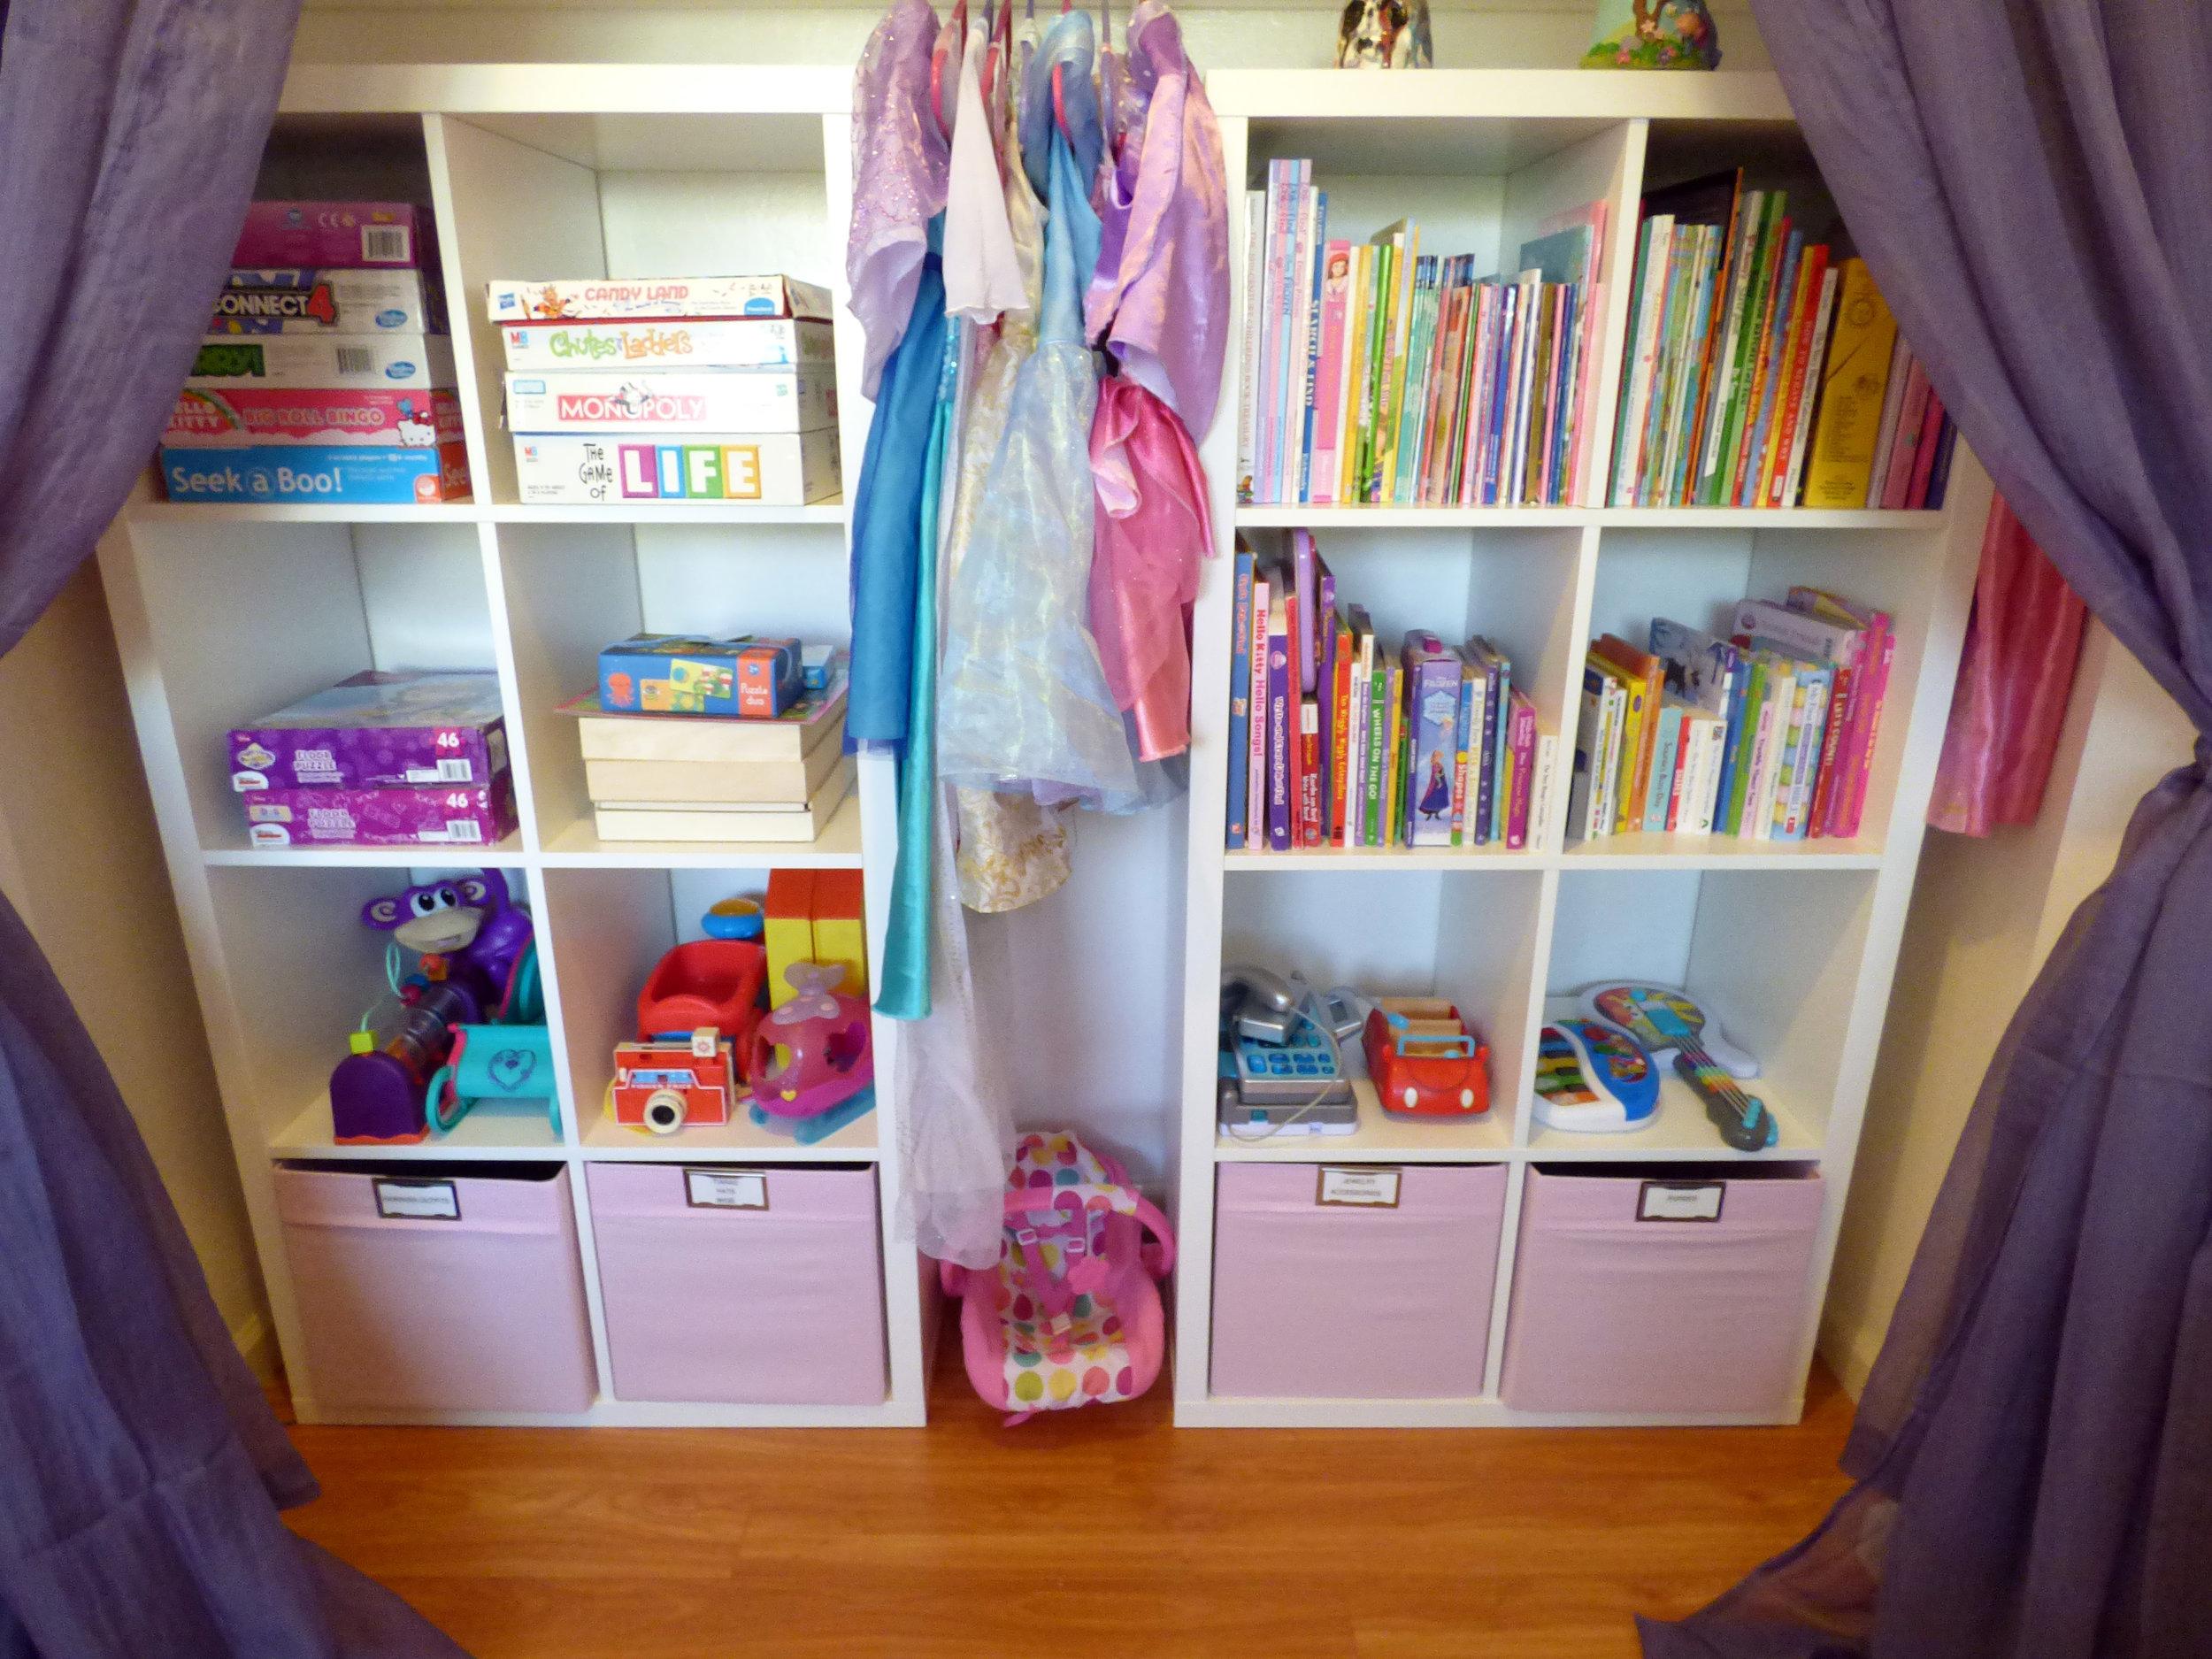 Cupertino Play Room Closet.jpg